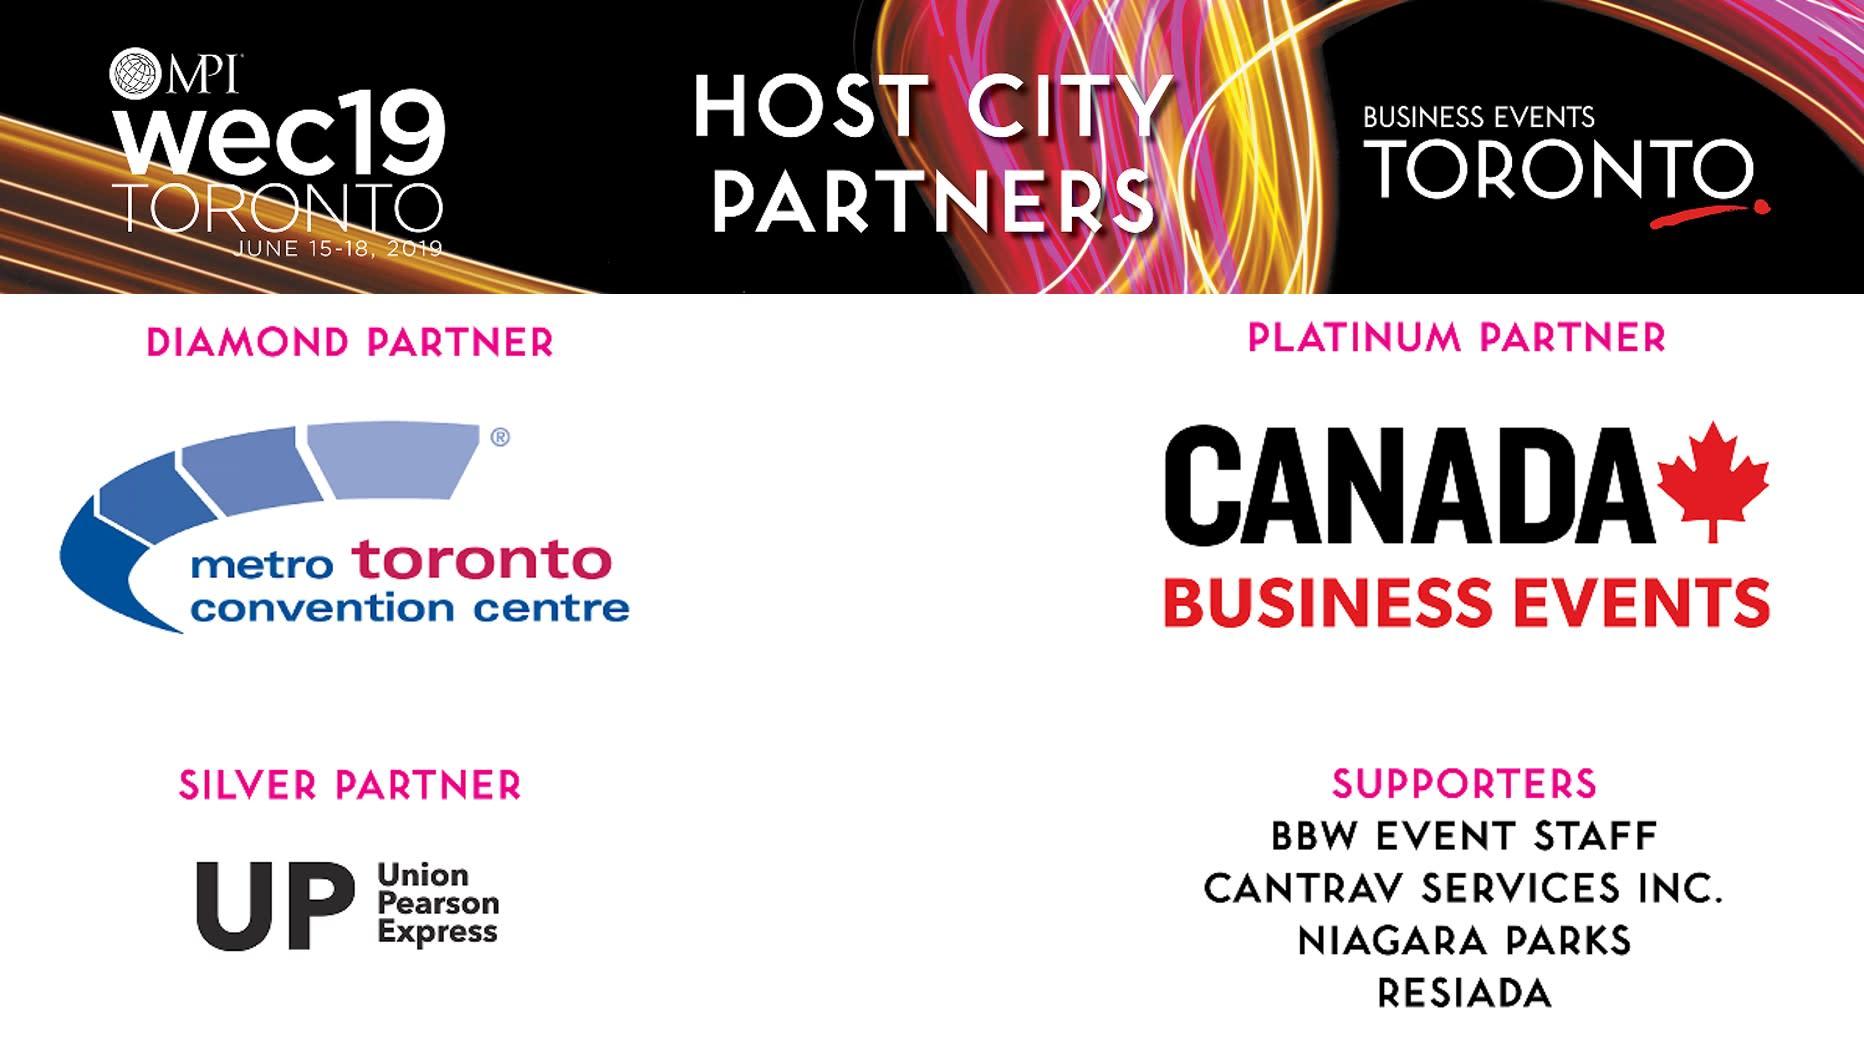 Host City Partners